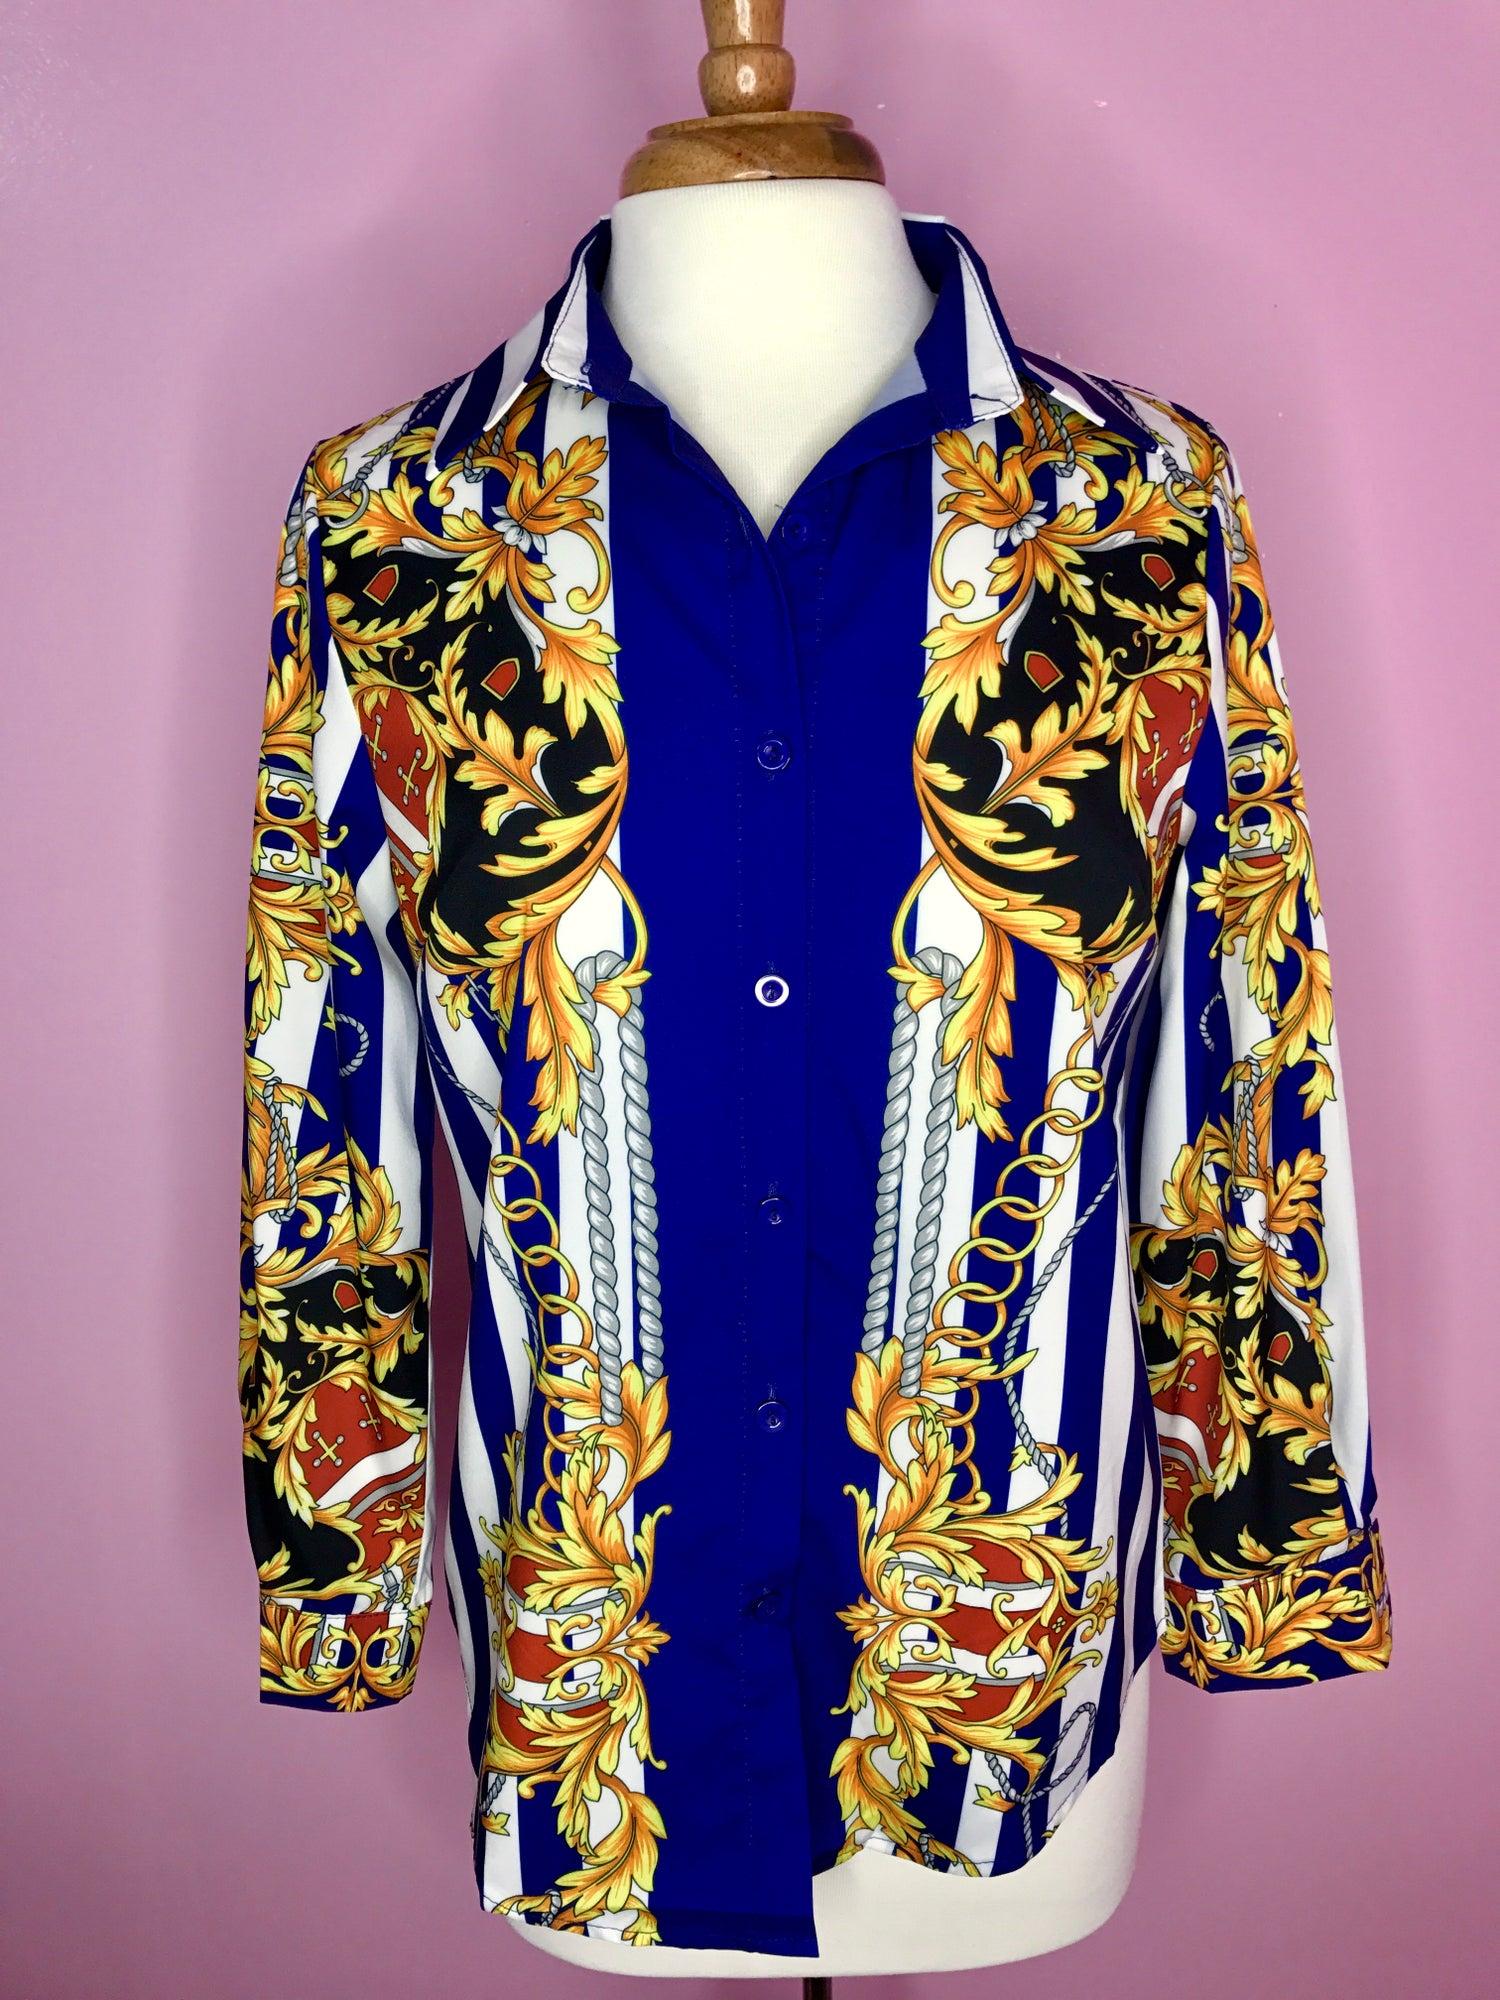 Image of Royale Printed Shirt